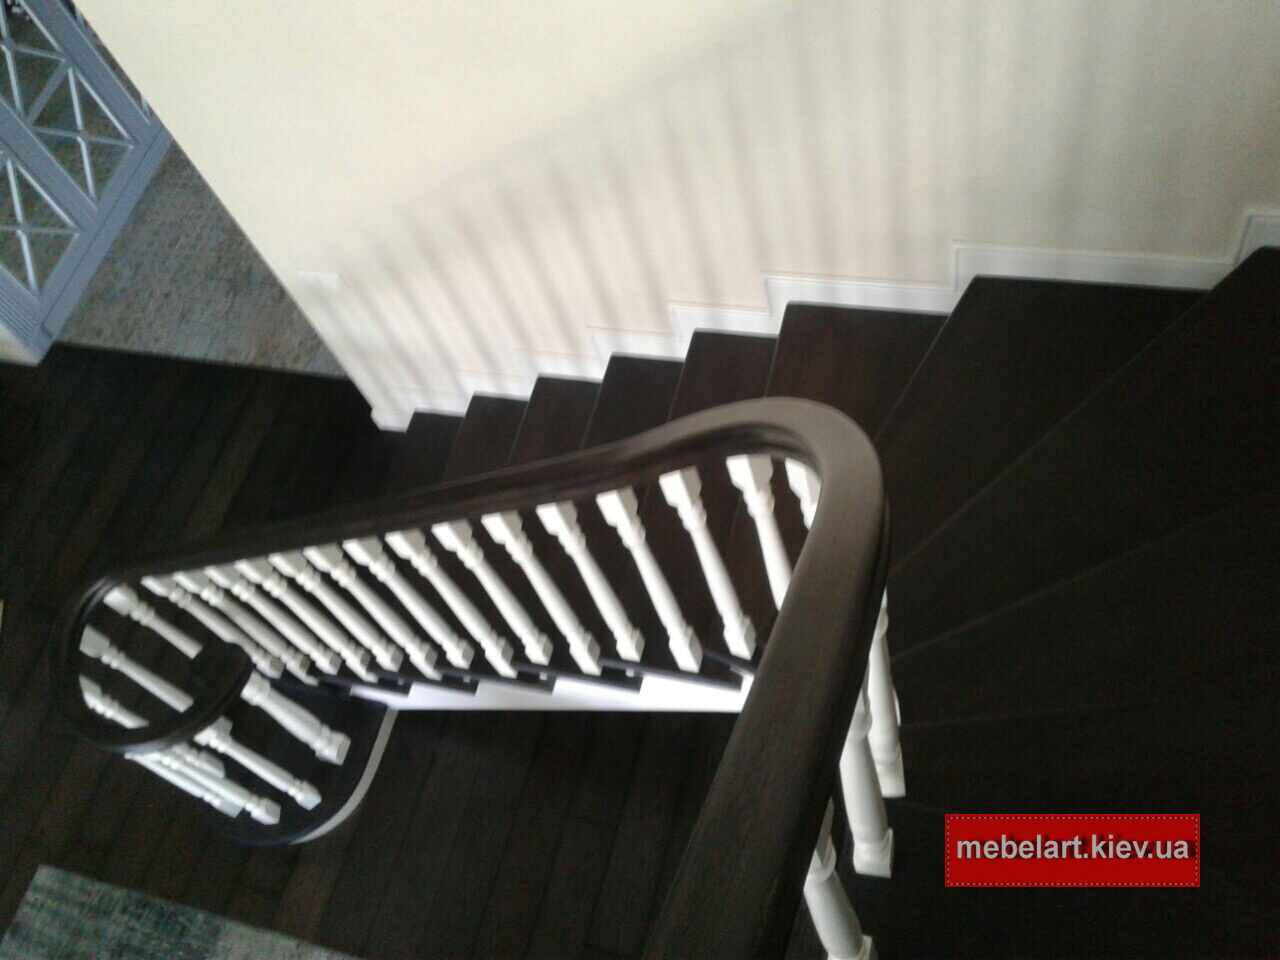 деревянная лестница на виллу под заказ Киев